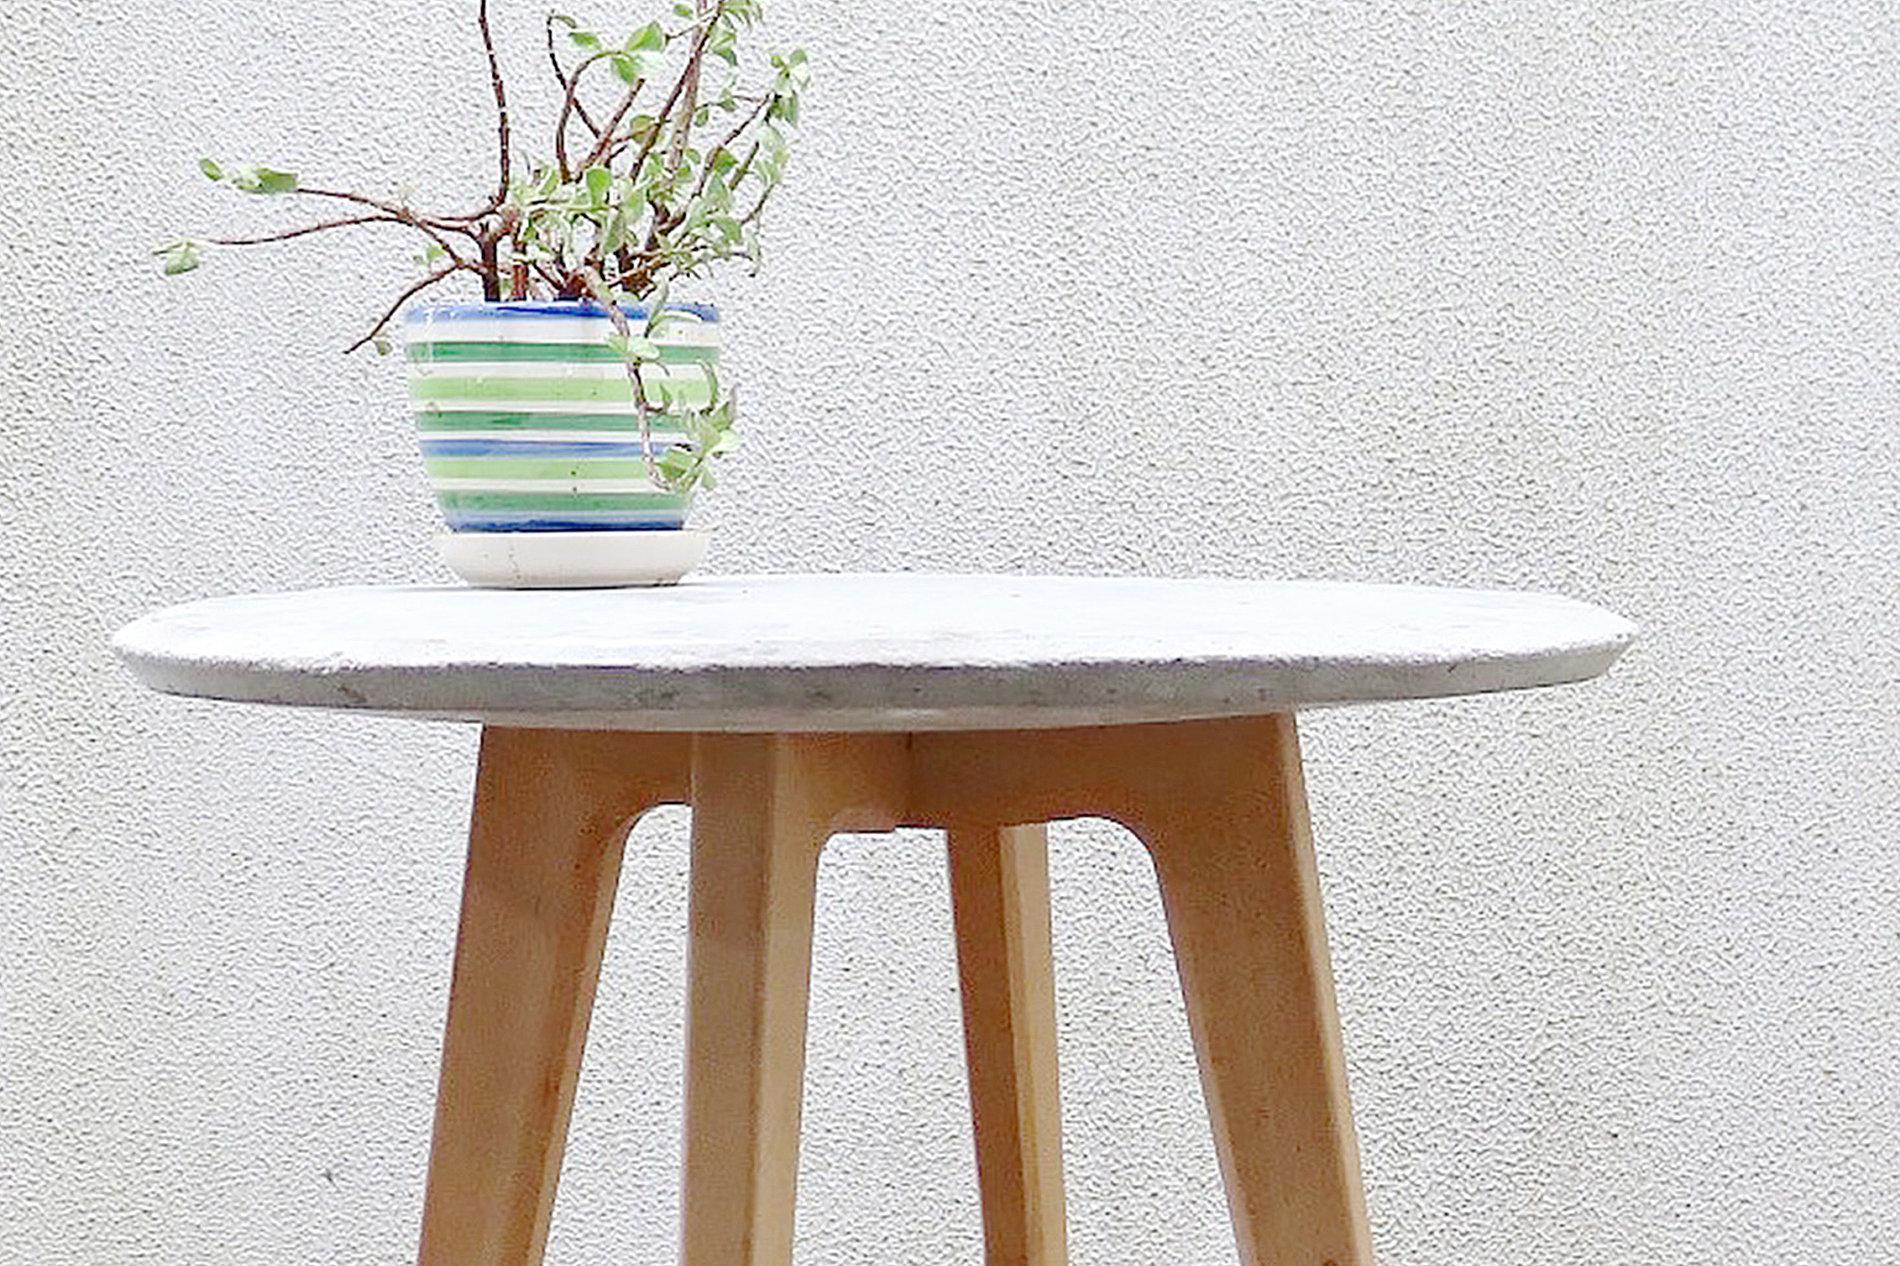 Splicing Furniture | Red Dot Design Award